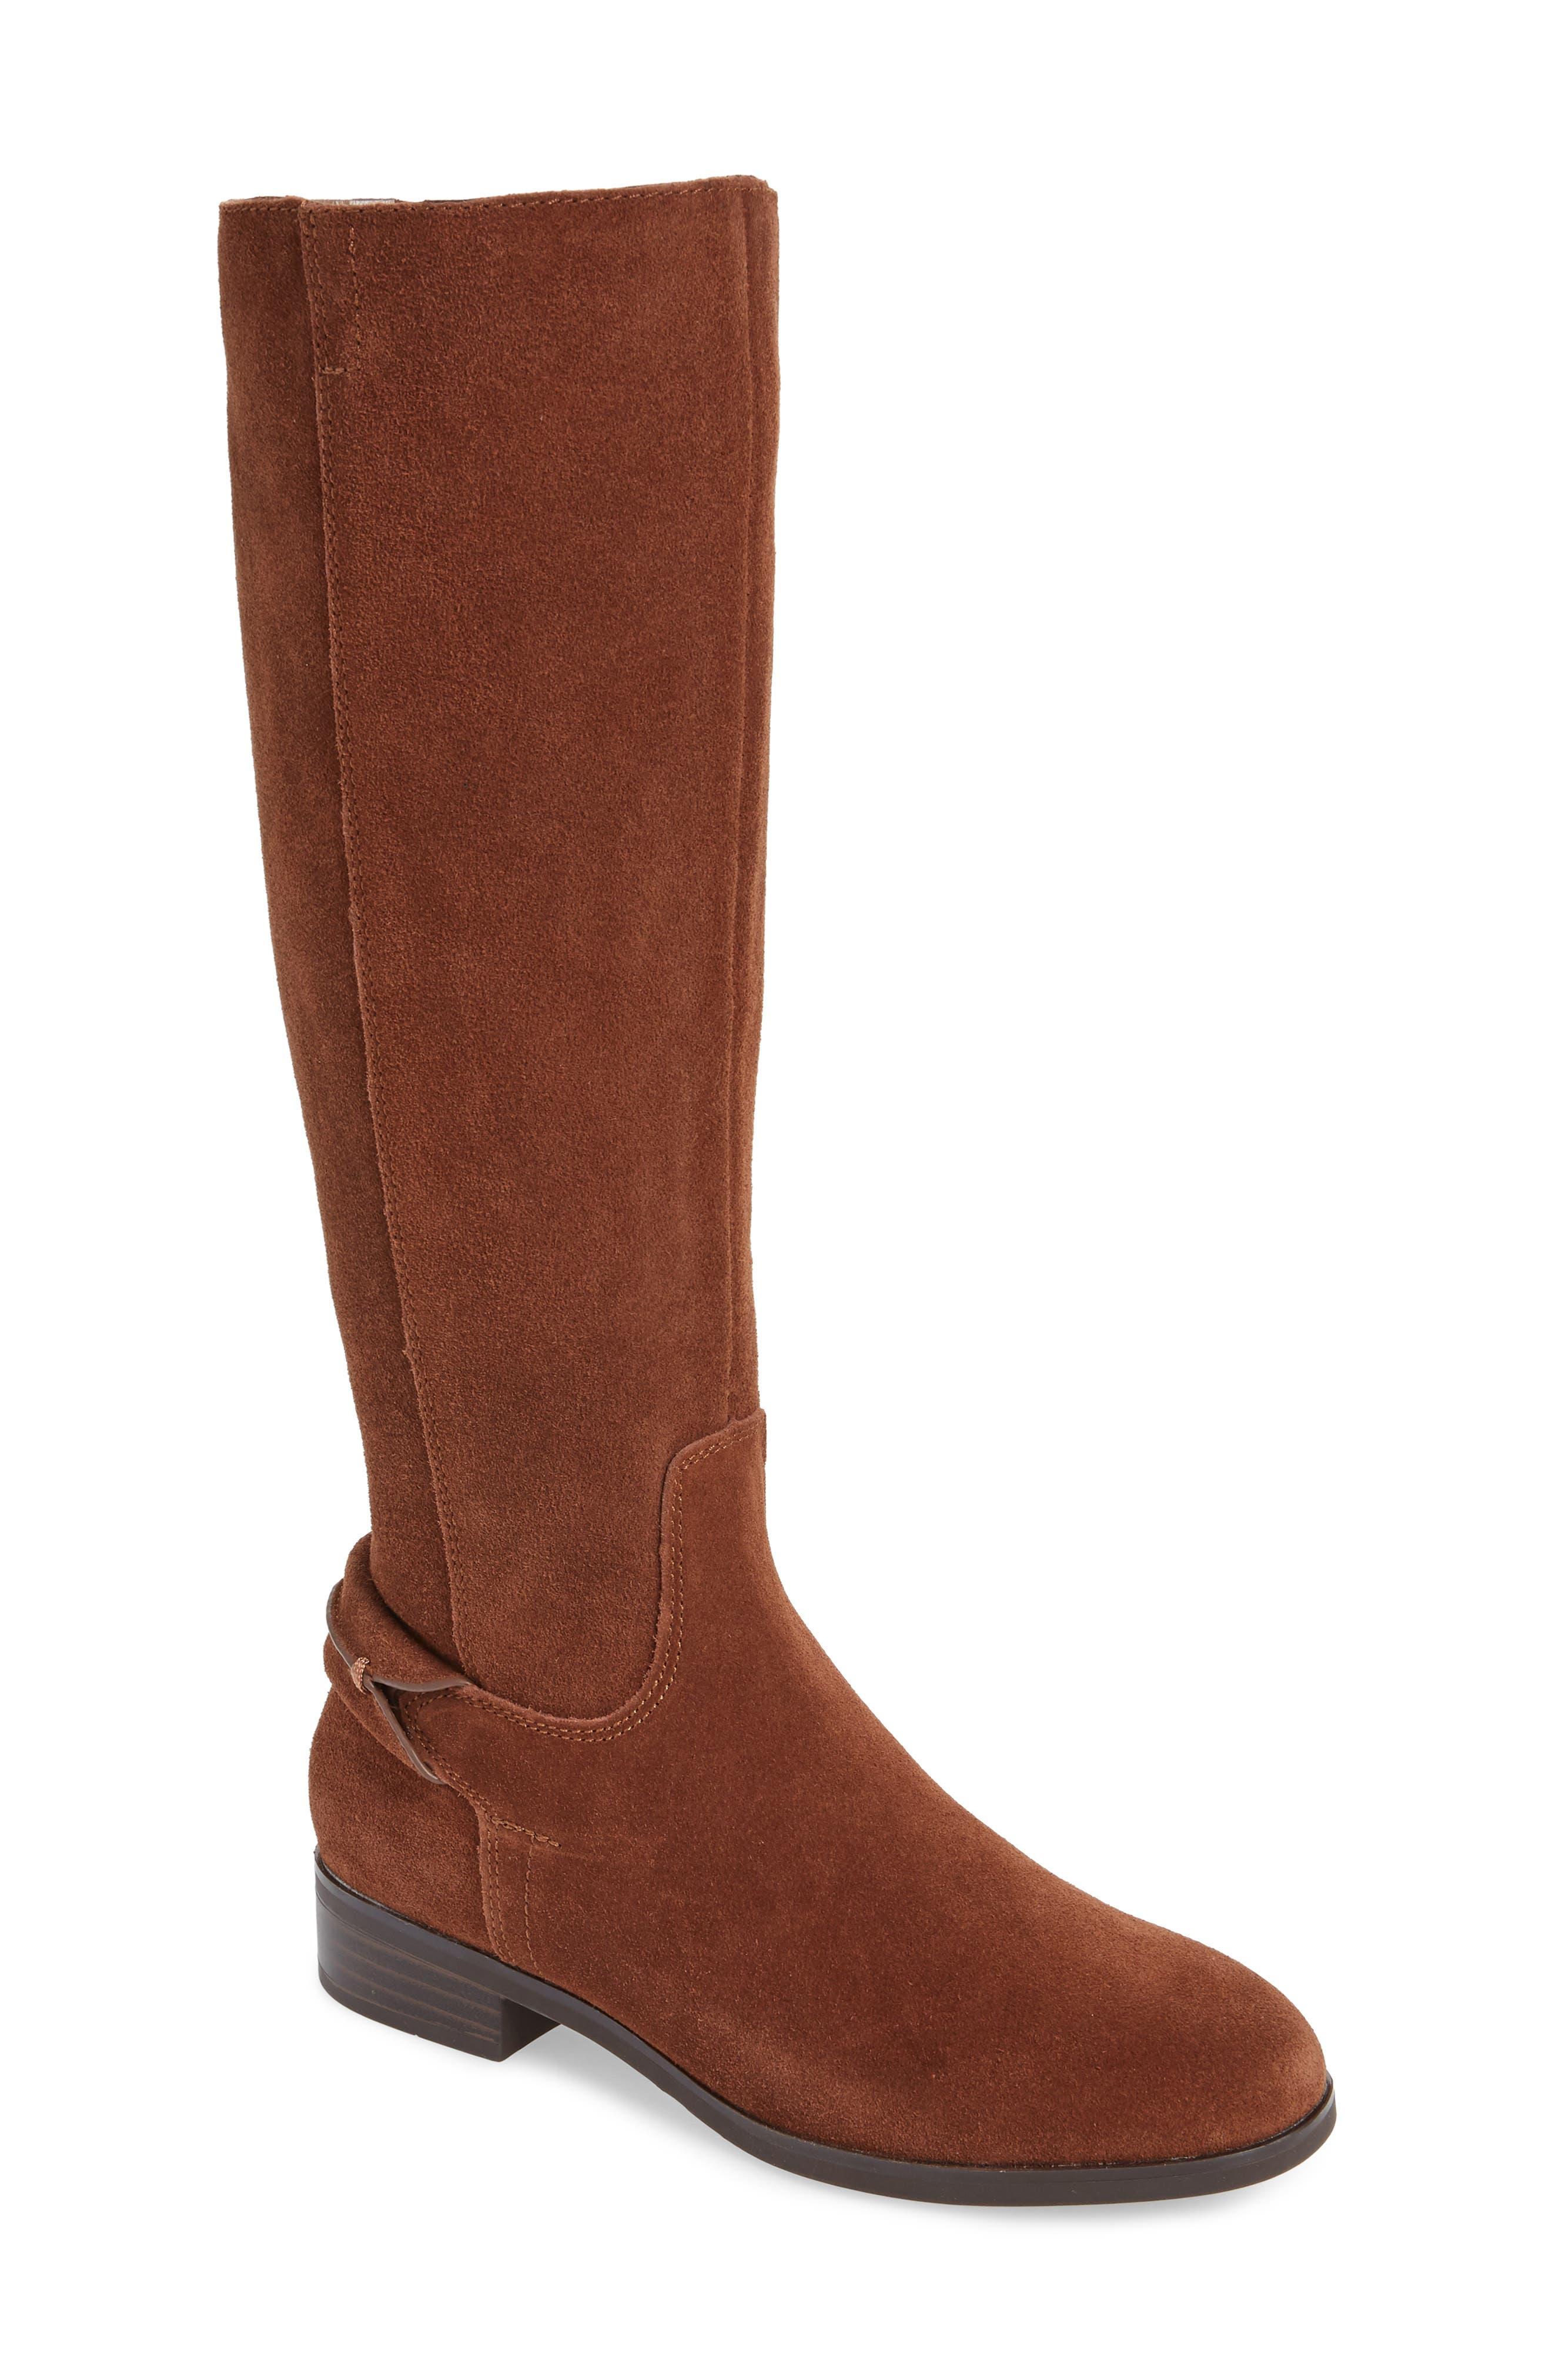 Kensie Cheverly Knee High Boot, Brown